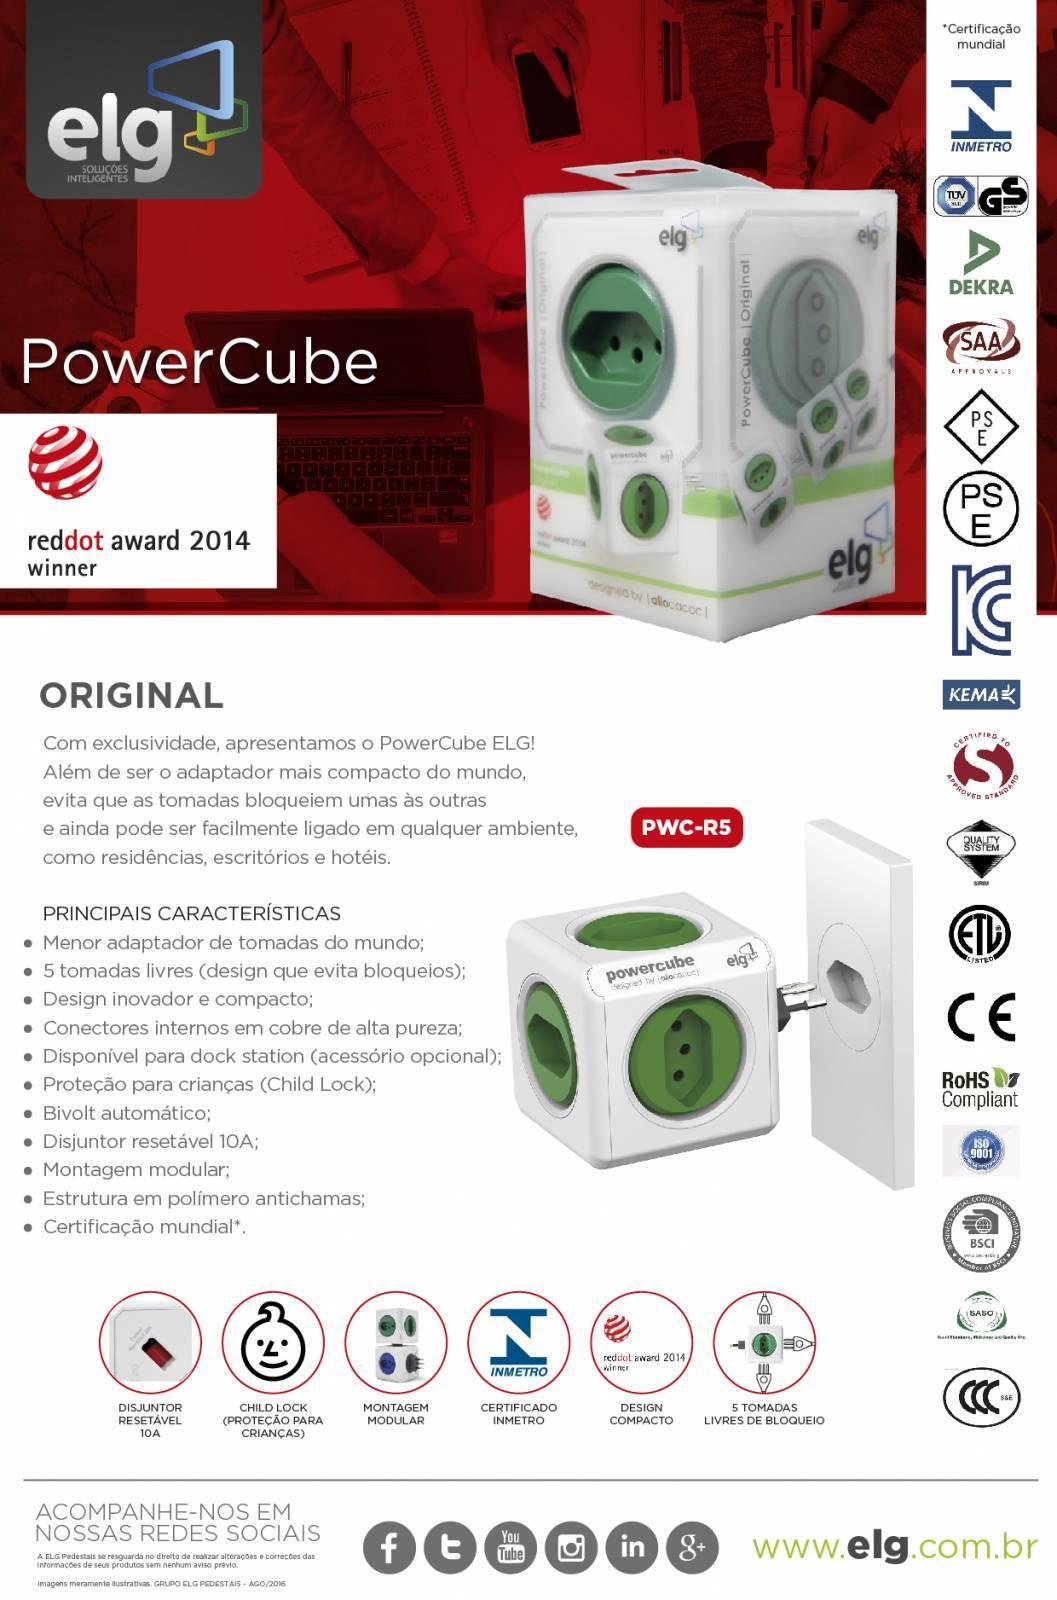 PowerCube Original PWC-R5 ELG Verde 5 Tomadas - Ilha Suportes